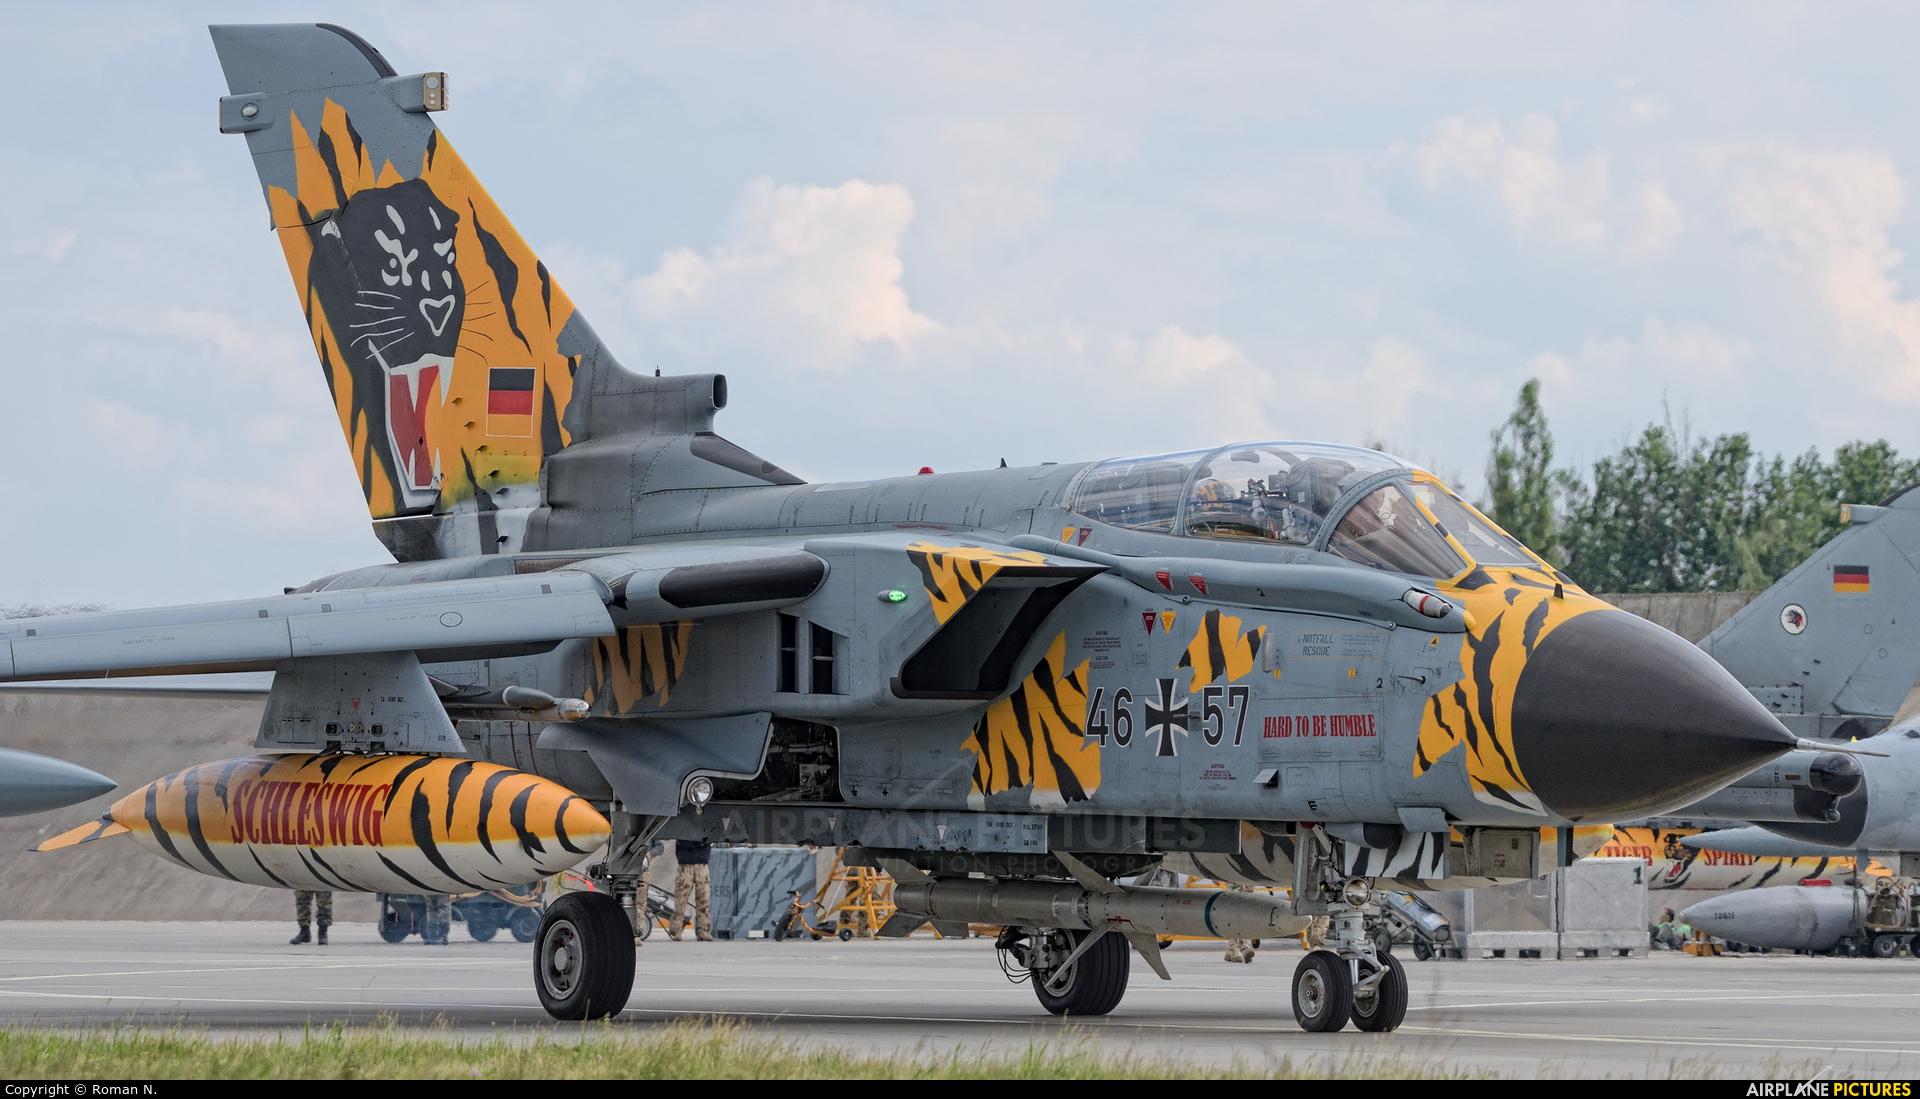 Germany - Air Force 46+57 aircraft at Poznań - Krzesiny